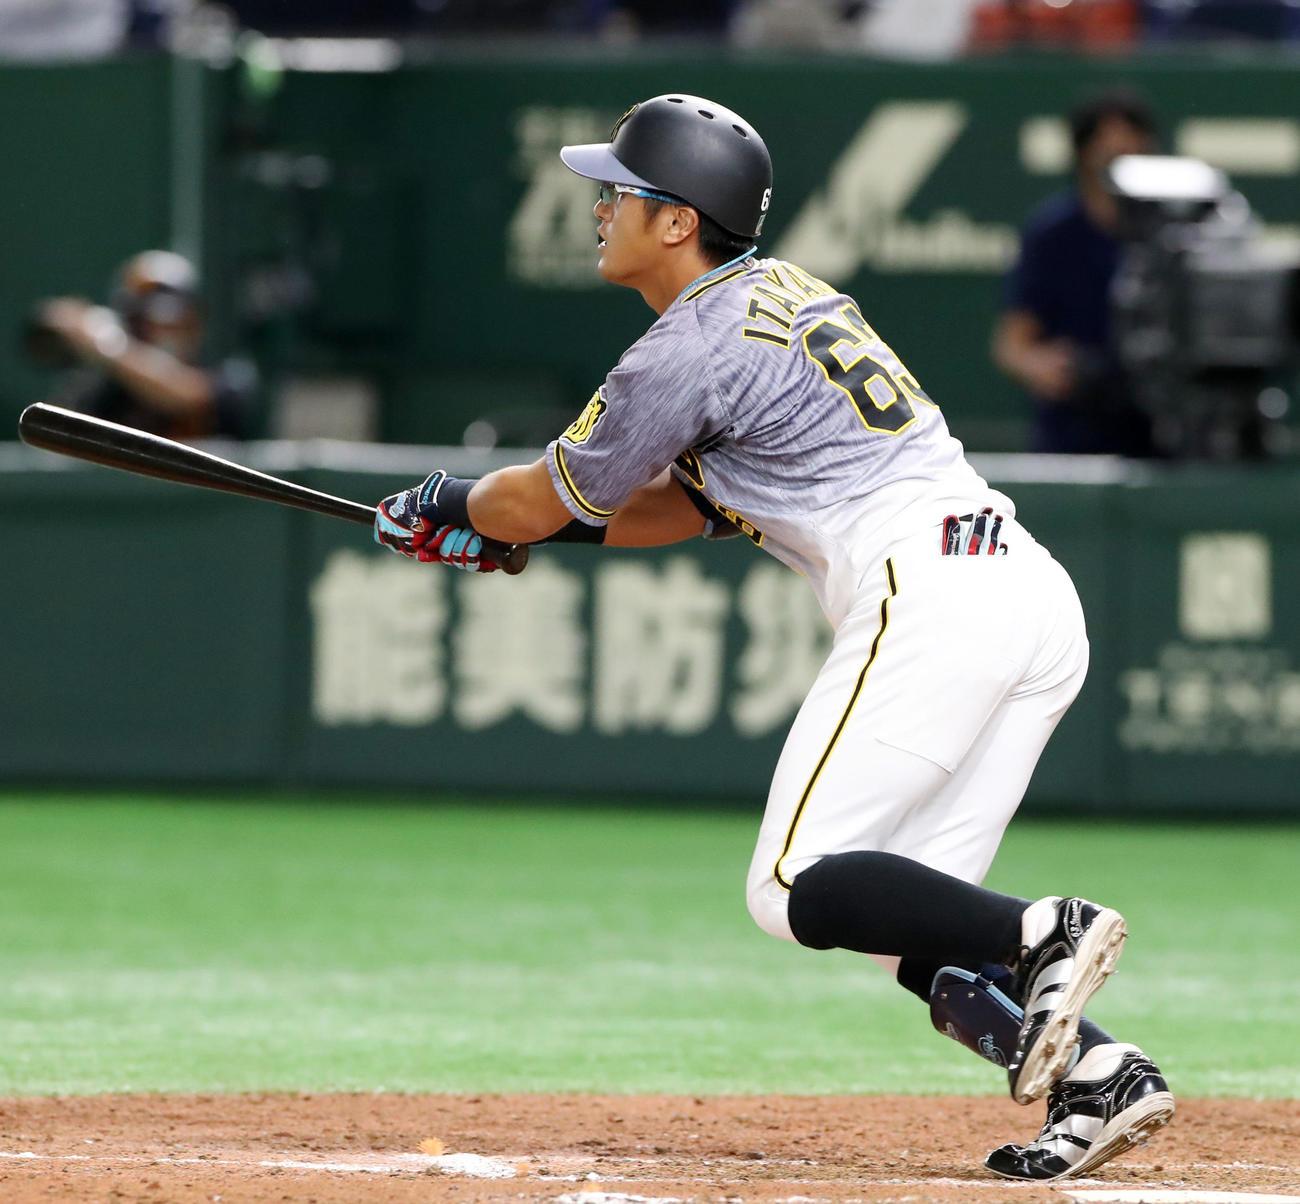 巨人対阪神 9回表阪神2死一、二塁、板山は右越え適時二塁打を放つ(撮影・加藤哉)